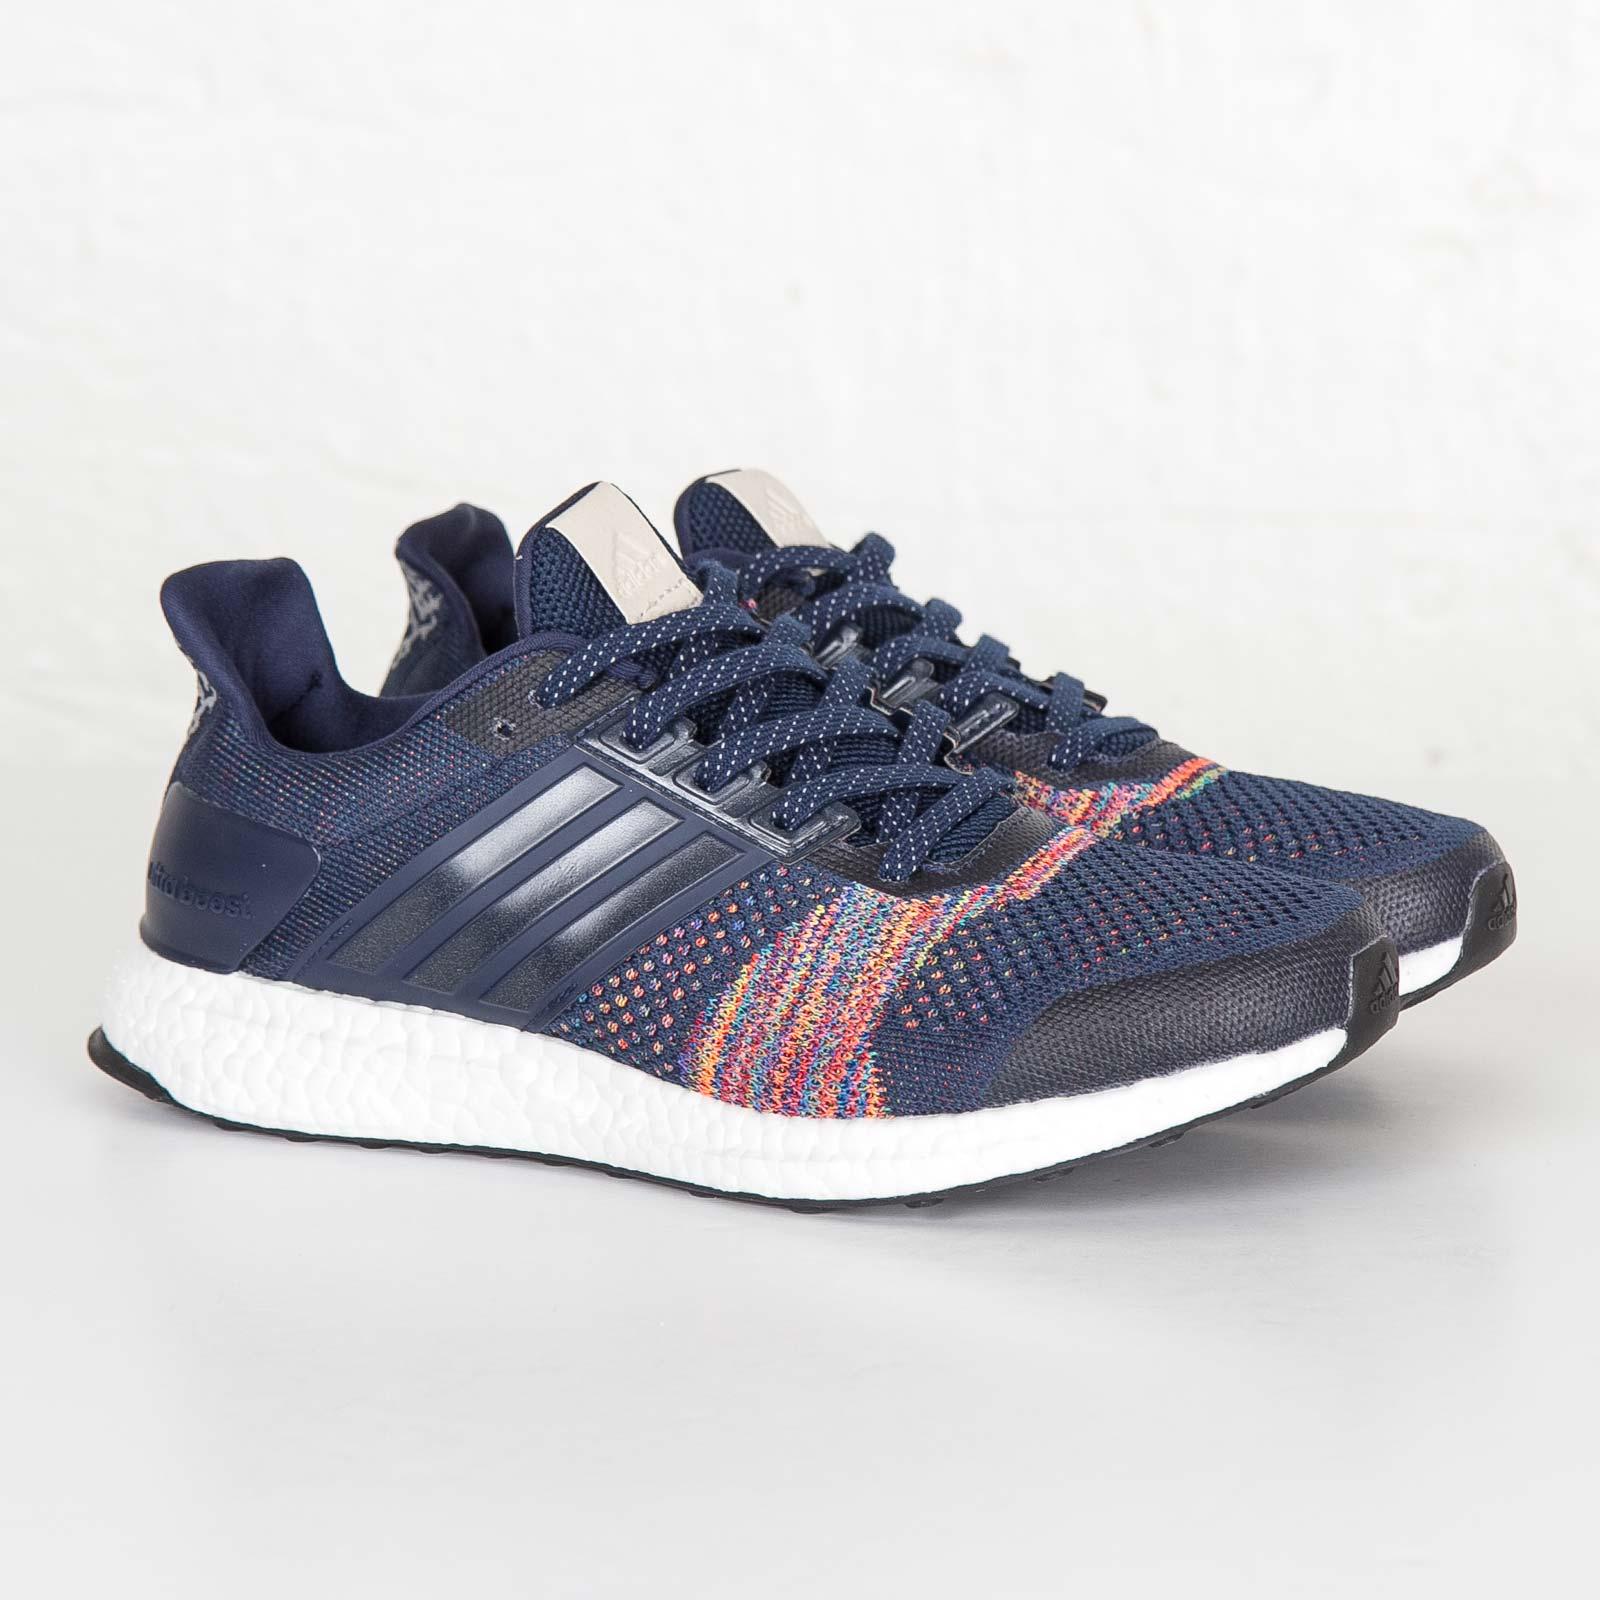 nouveau style 065e2 38d33 adidas Ultra Boost ST Ltd - Aq5557 - Sneakersnstuff ...